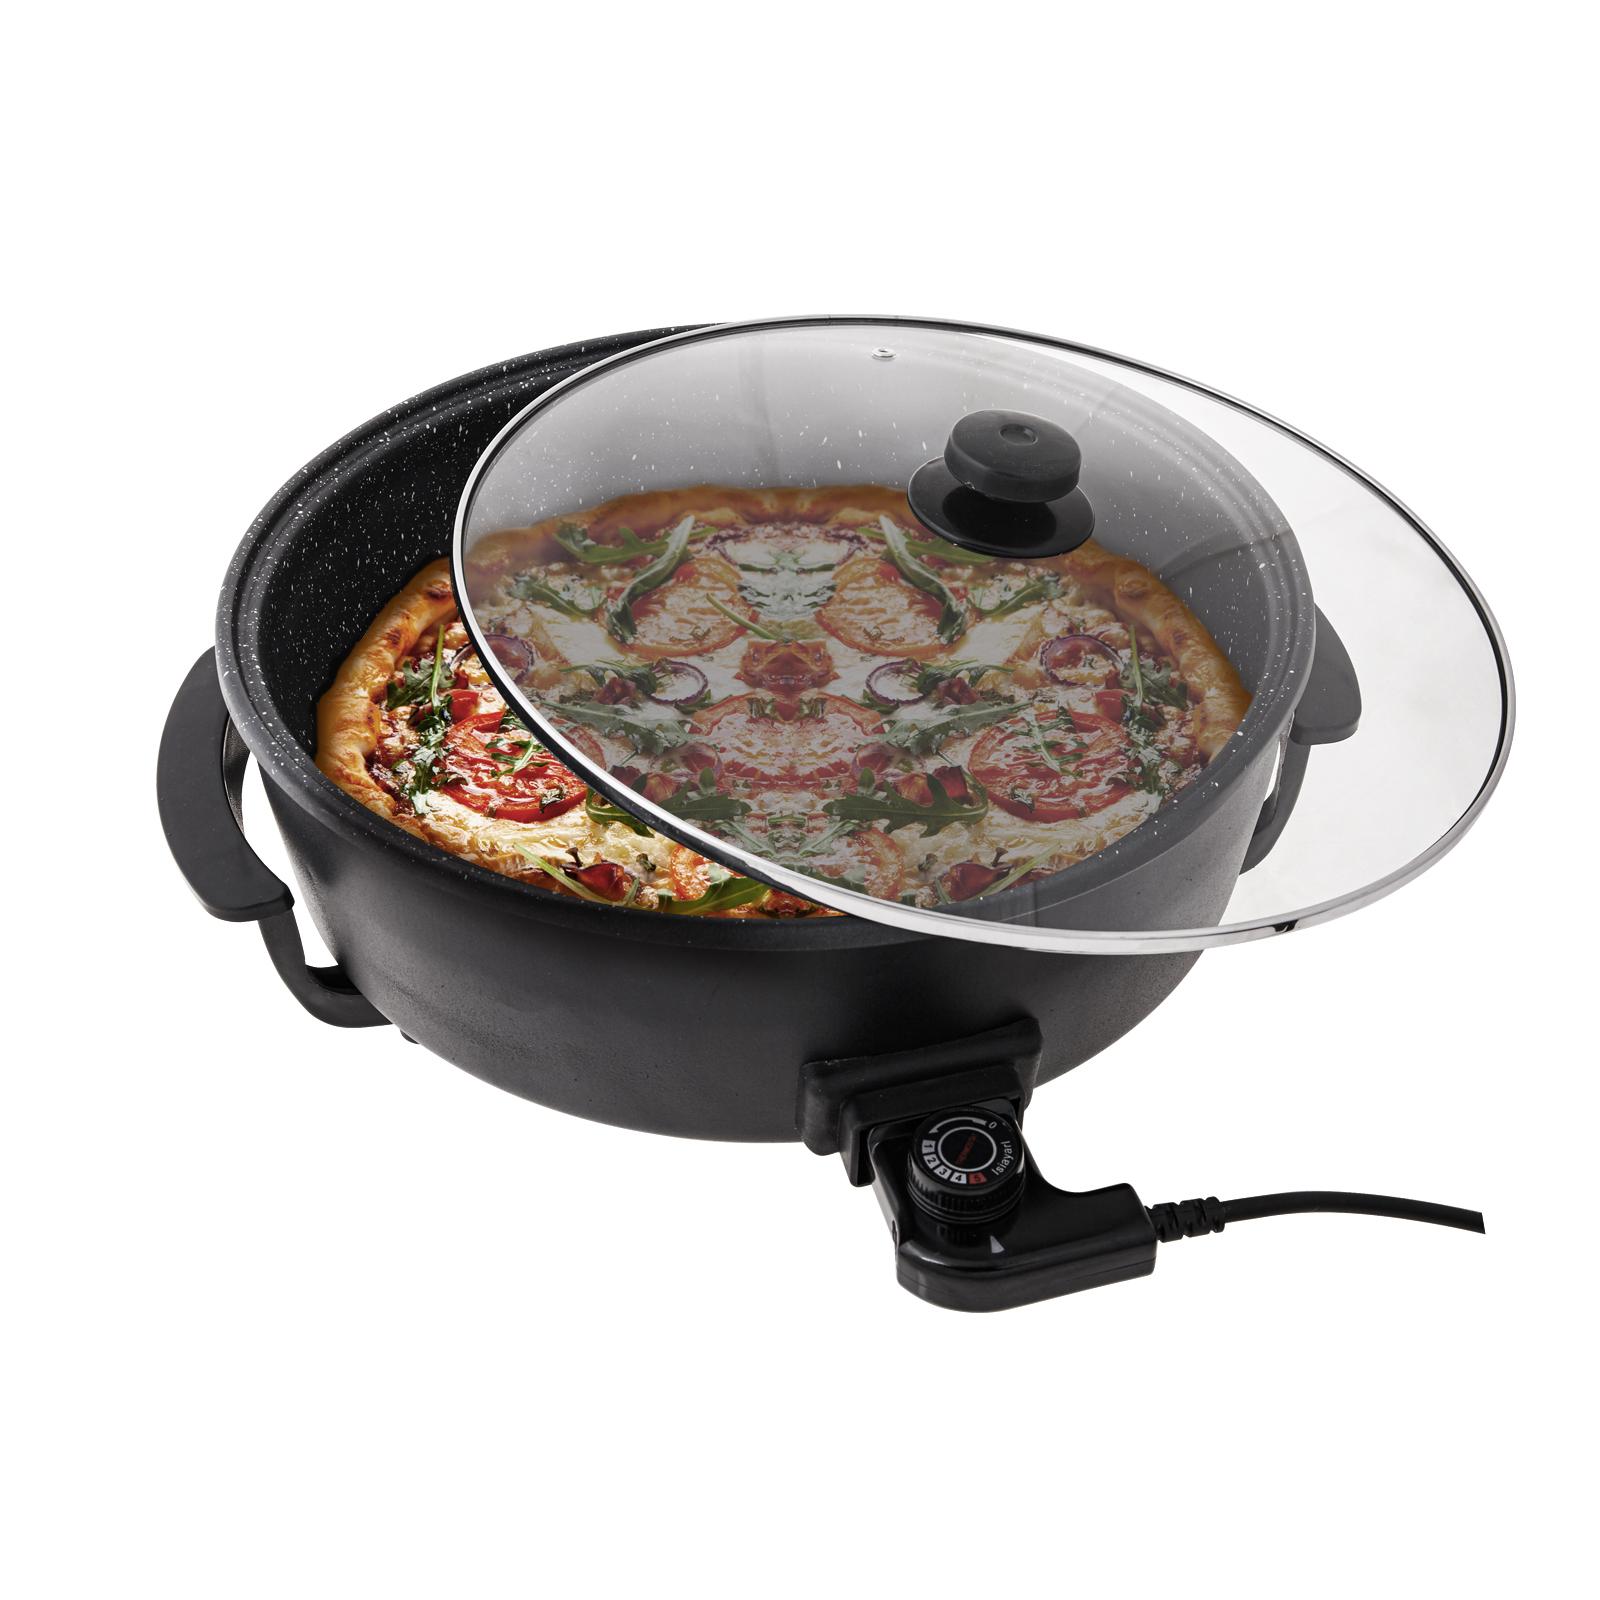 Emsan Magic Chef Siyah Çok Amaçlı Pişirici Pizza Tavası